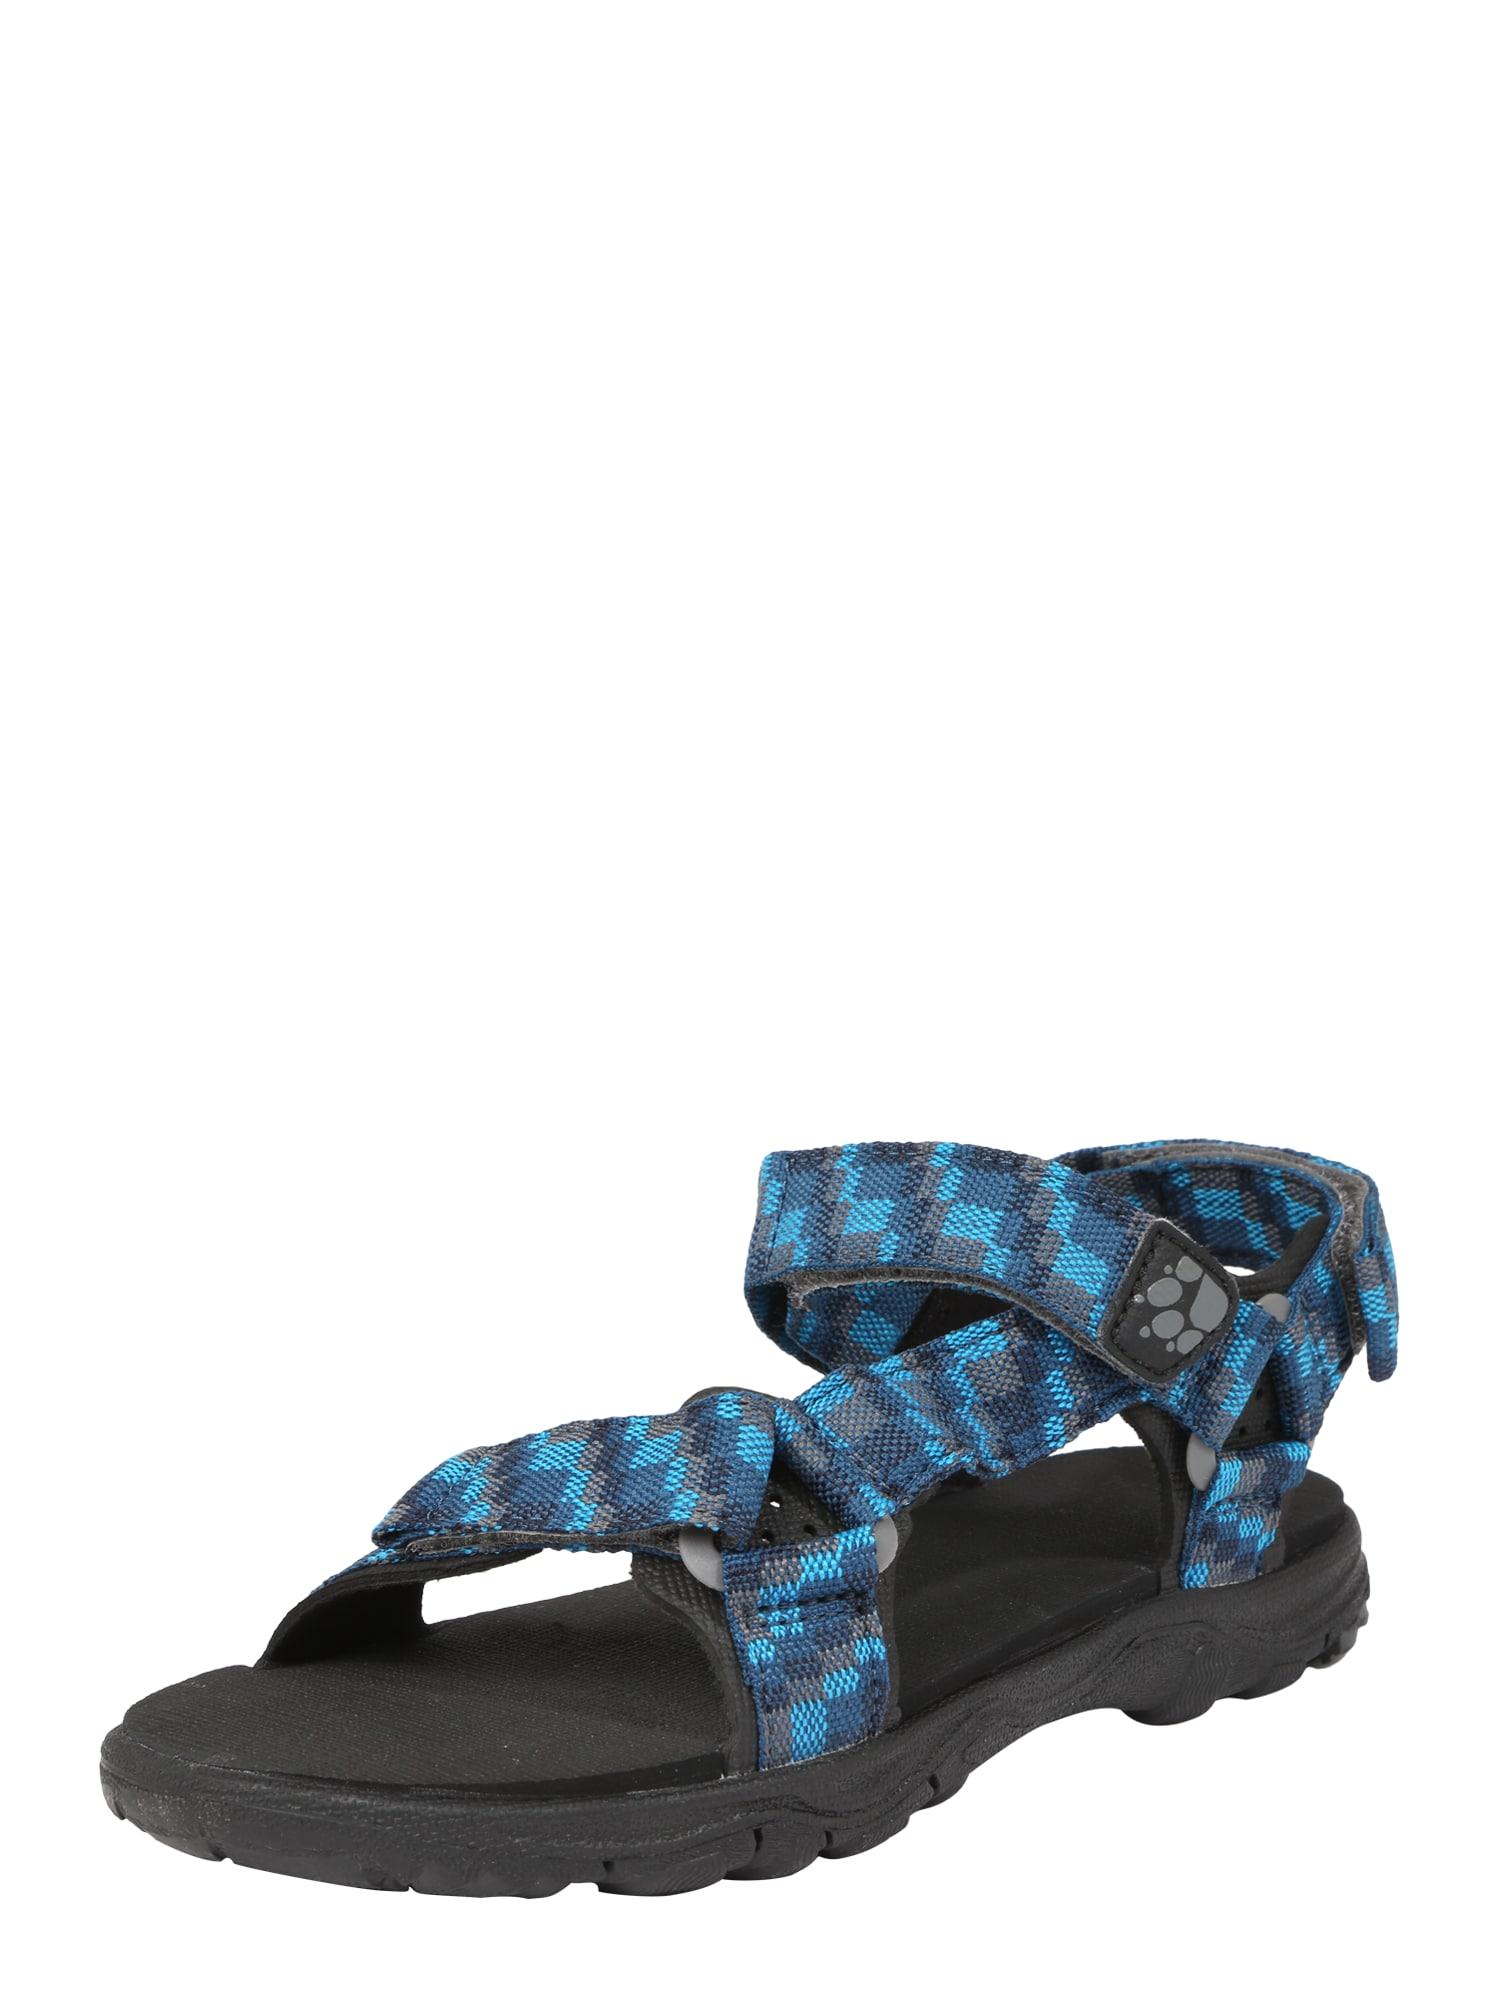 JACK WOLFSKIN Sandalai 'Seven Seas 2' mėlyna / juoda